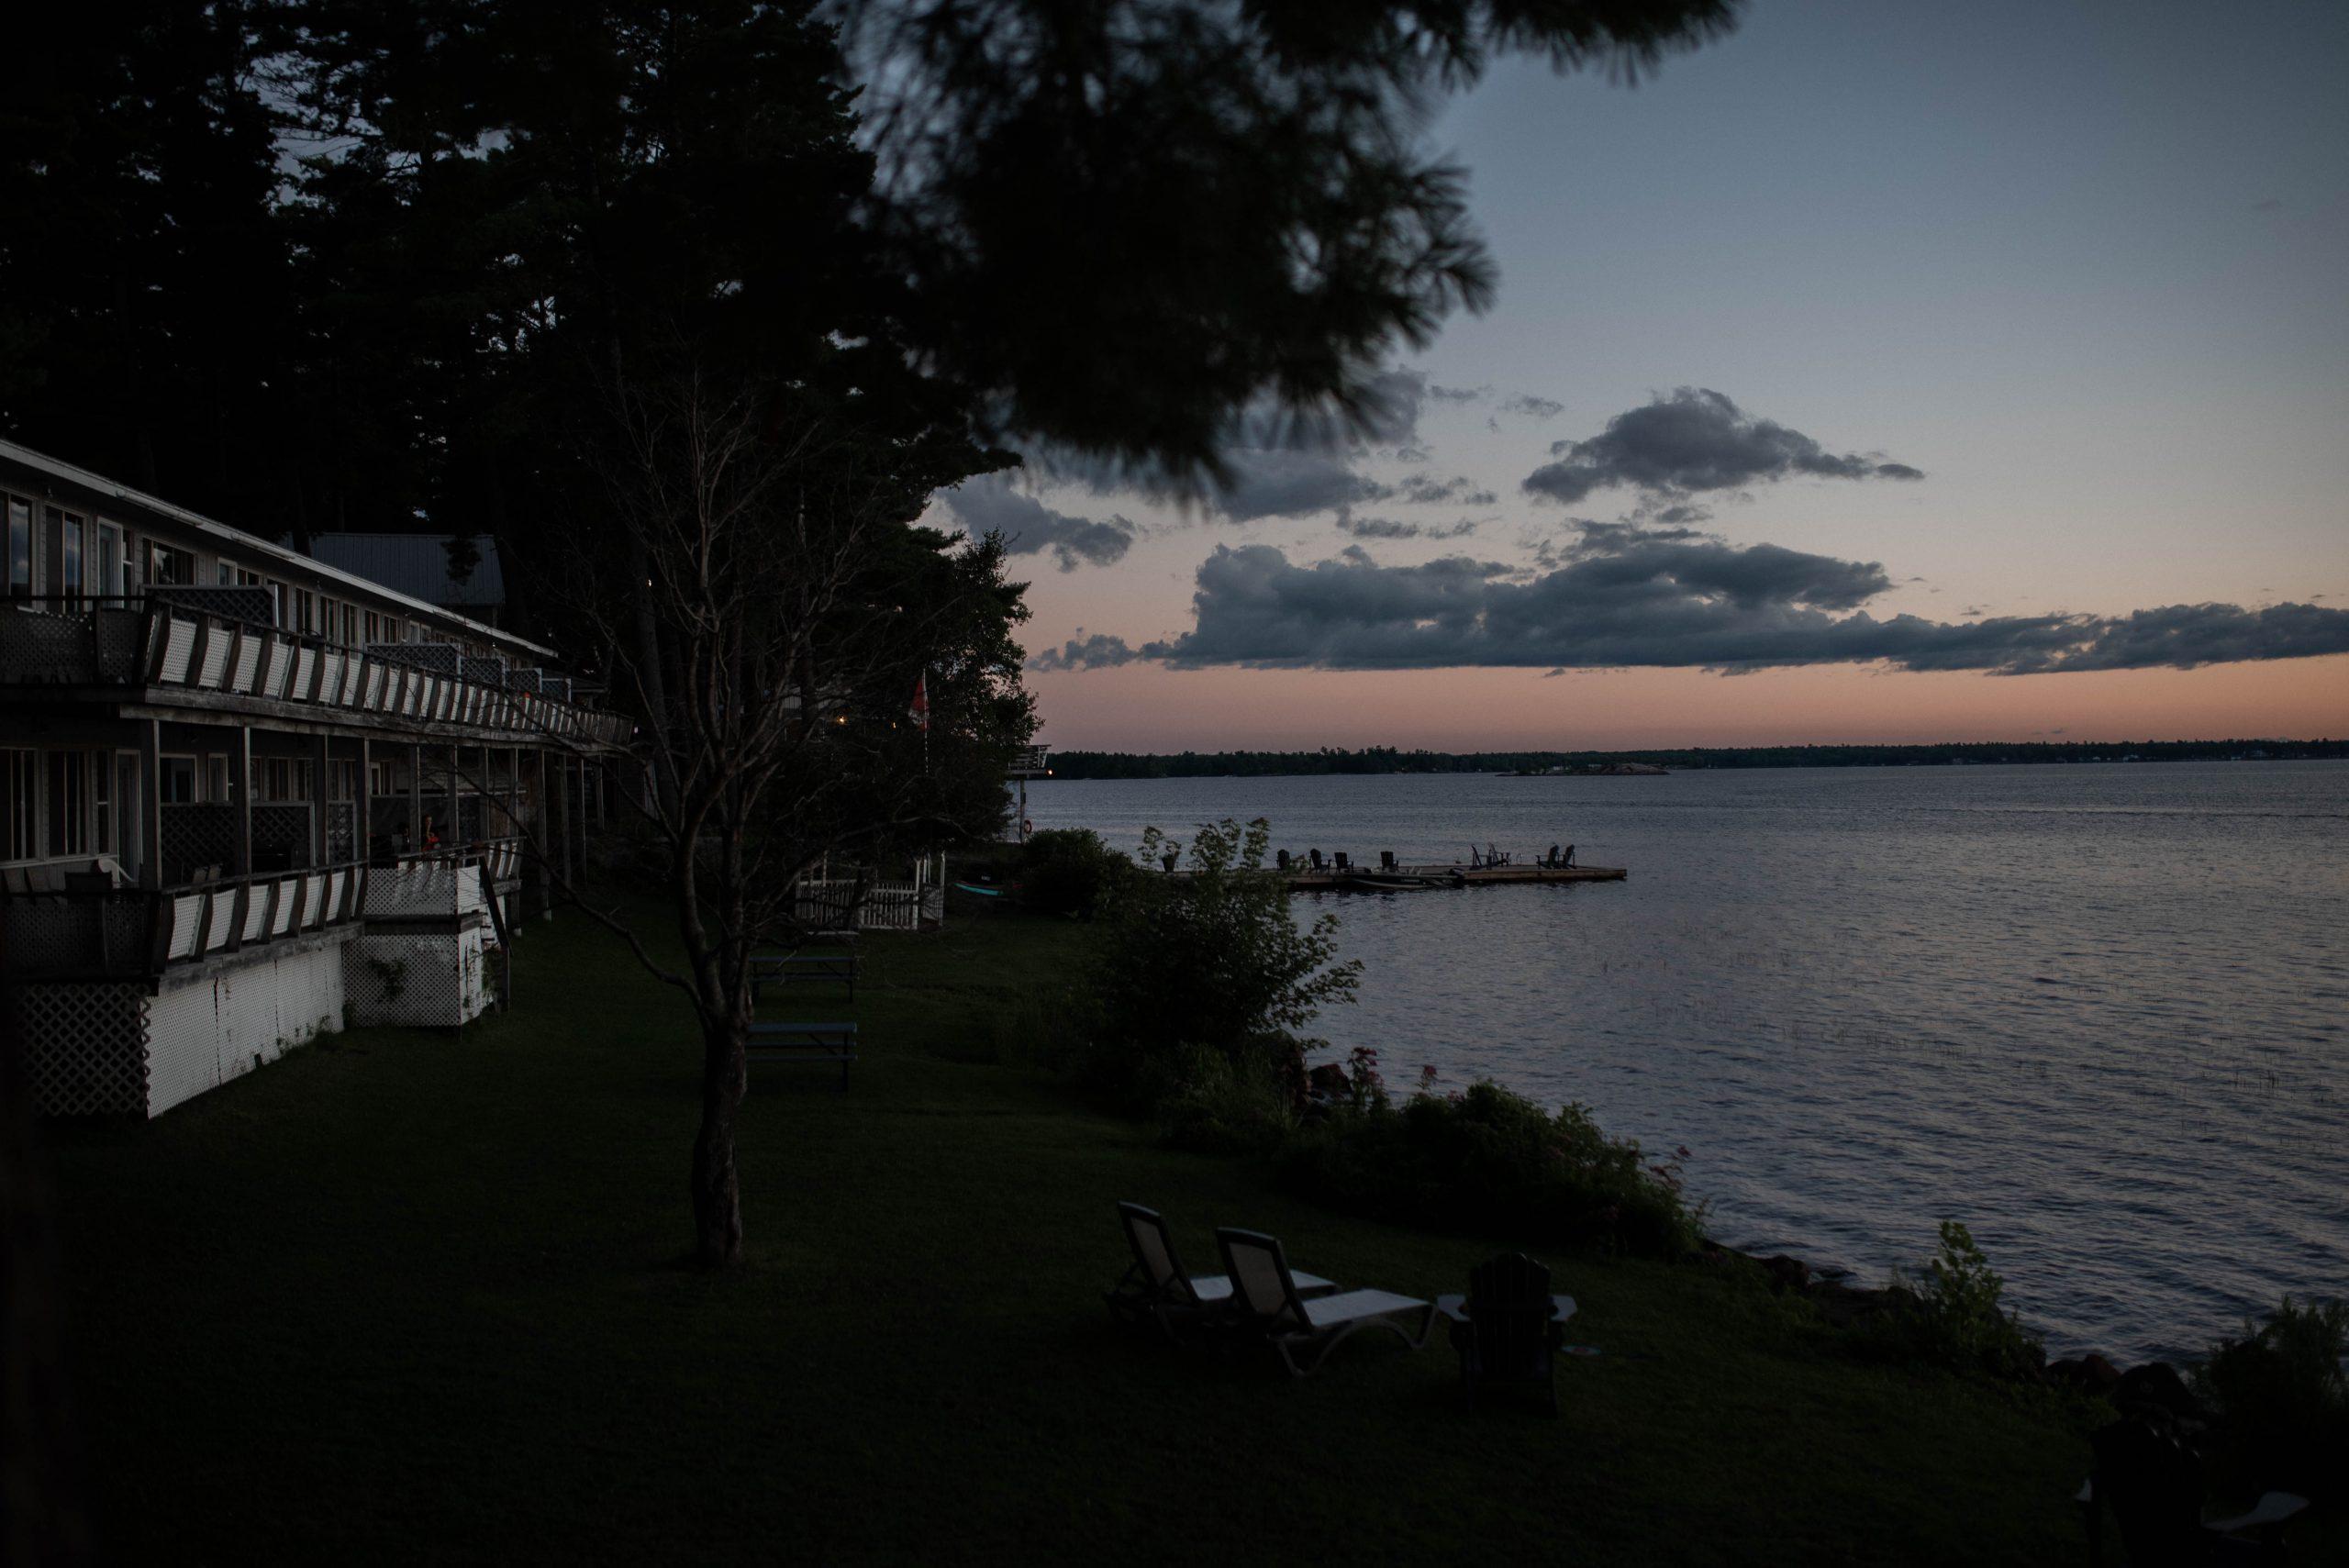 Sunset over the lake in Muskoka